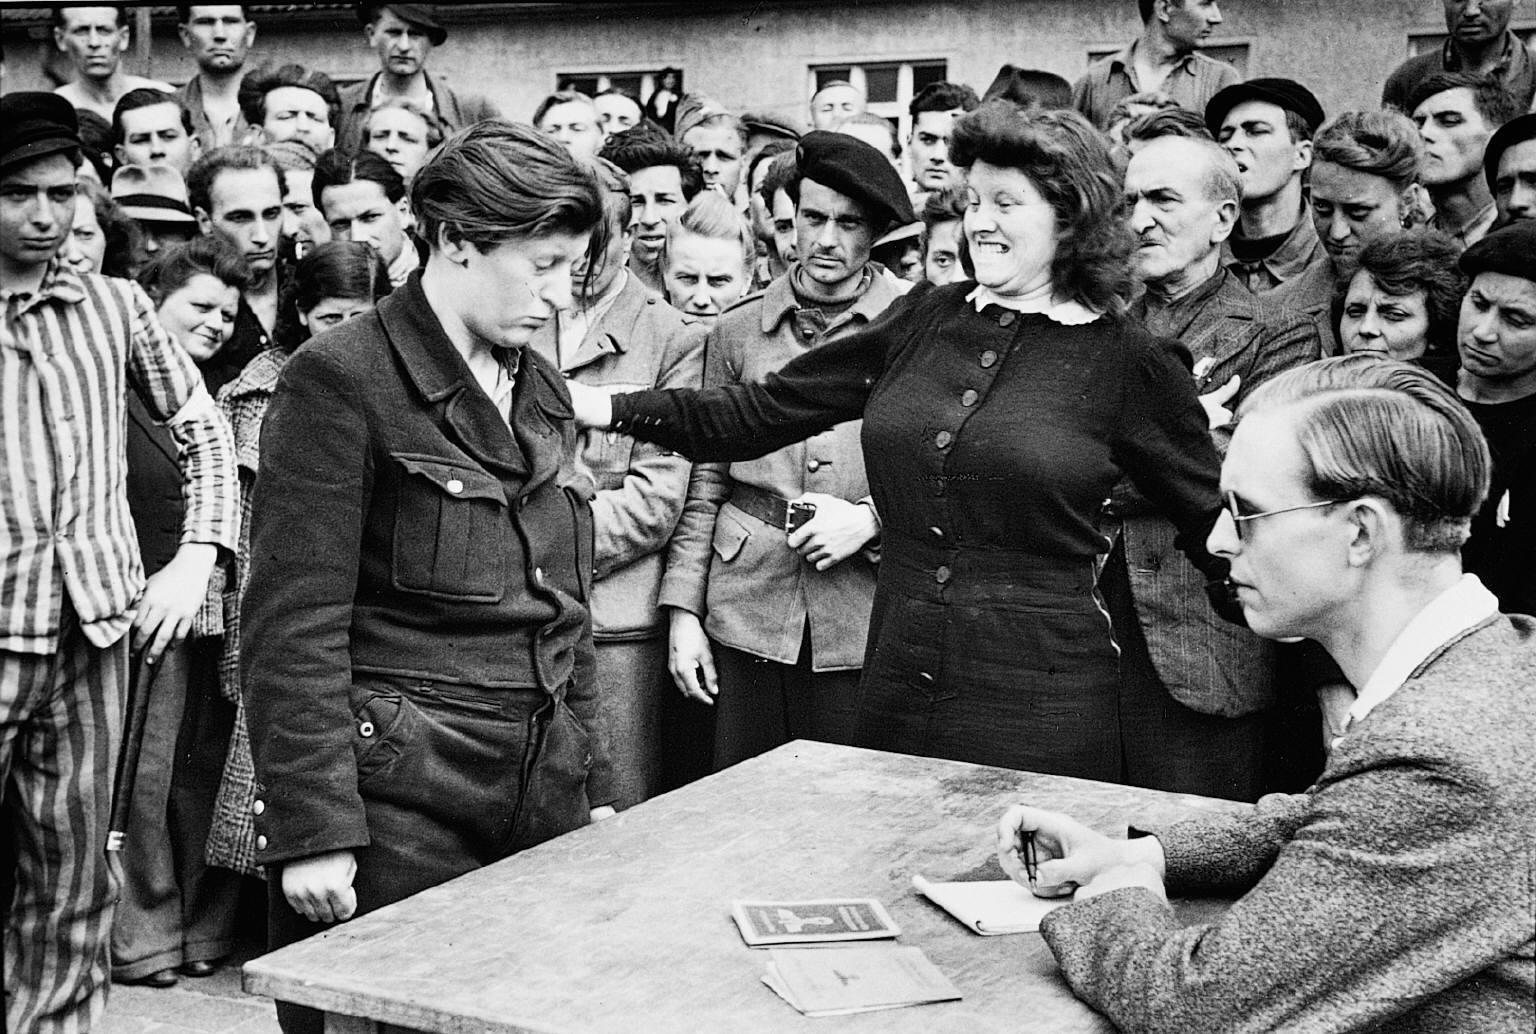 Fotografía artística - histórica - periodística  - Página 9 Henri-cartier-bresson-gestapo-informer-dessau-germany-1945